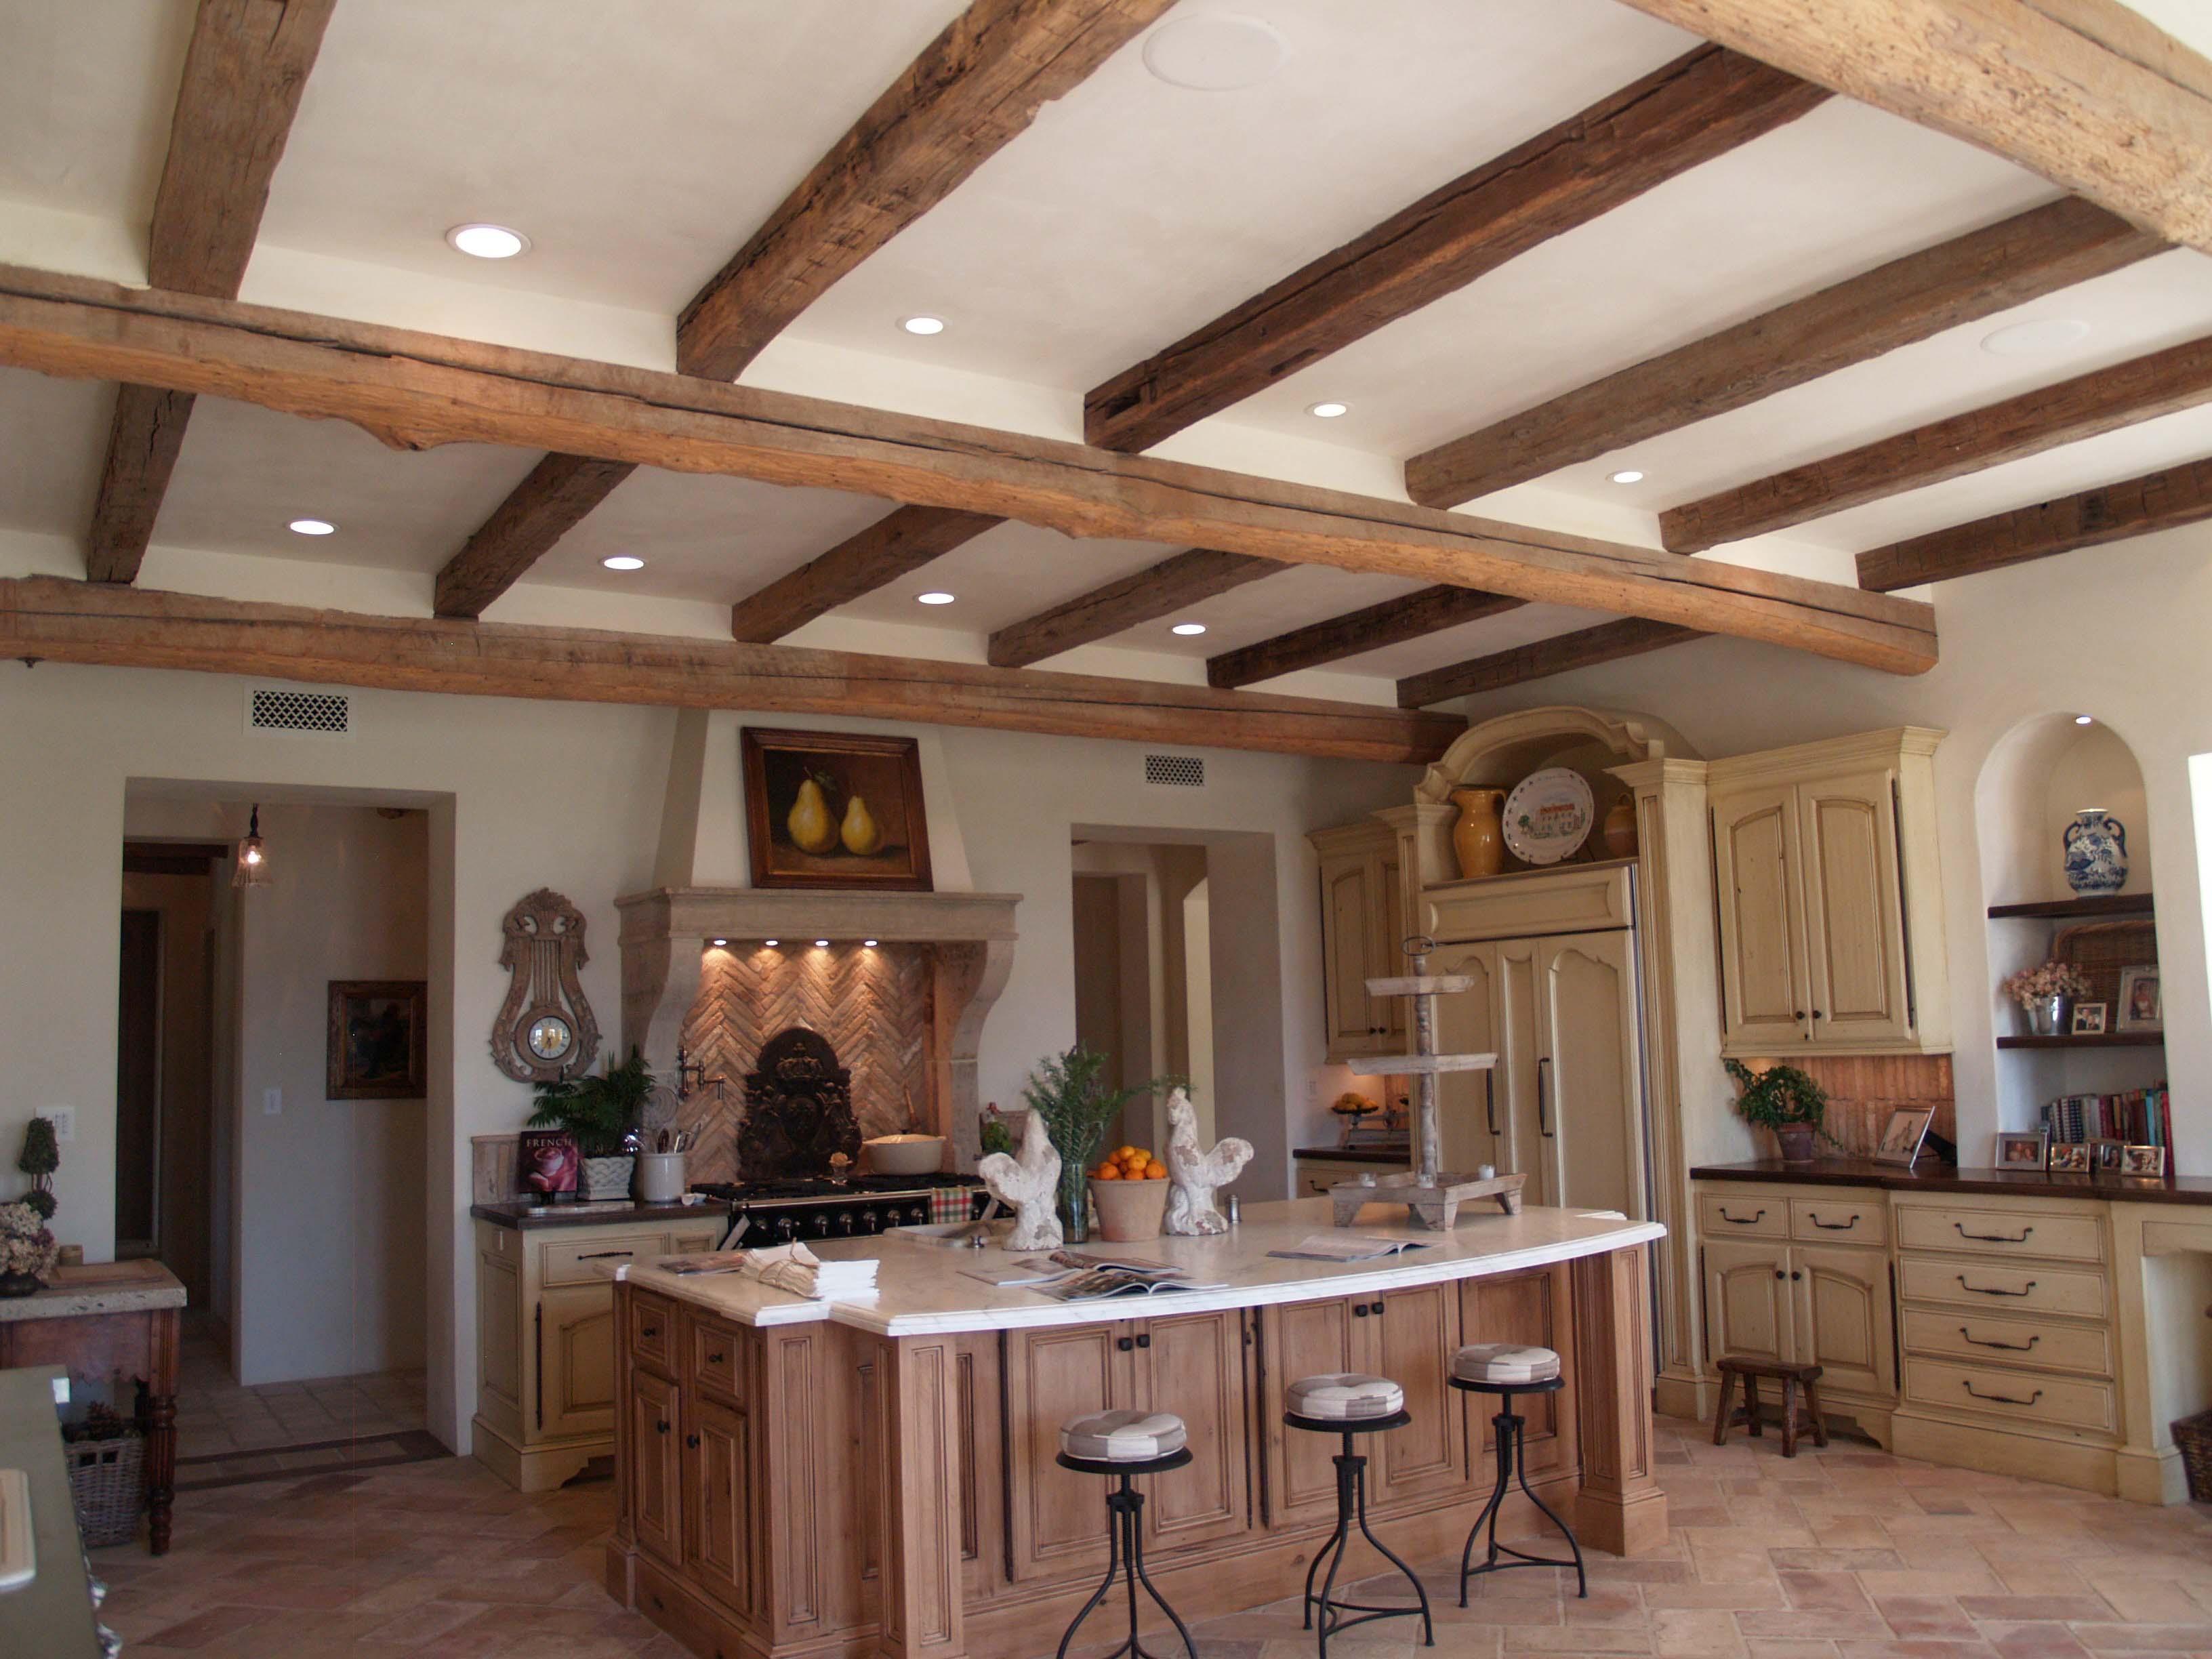 edge hardwood beams02 - Reclaimed Hardwood Barn Timbers